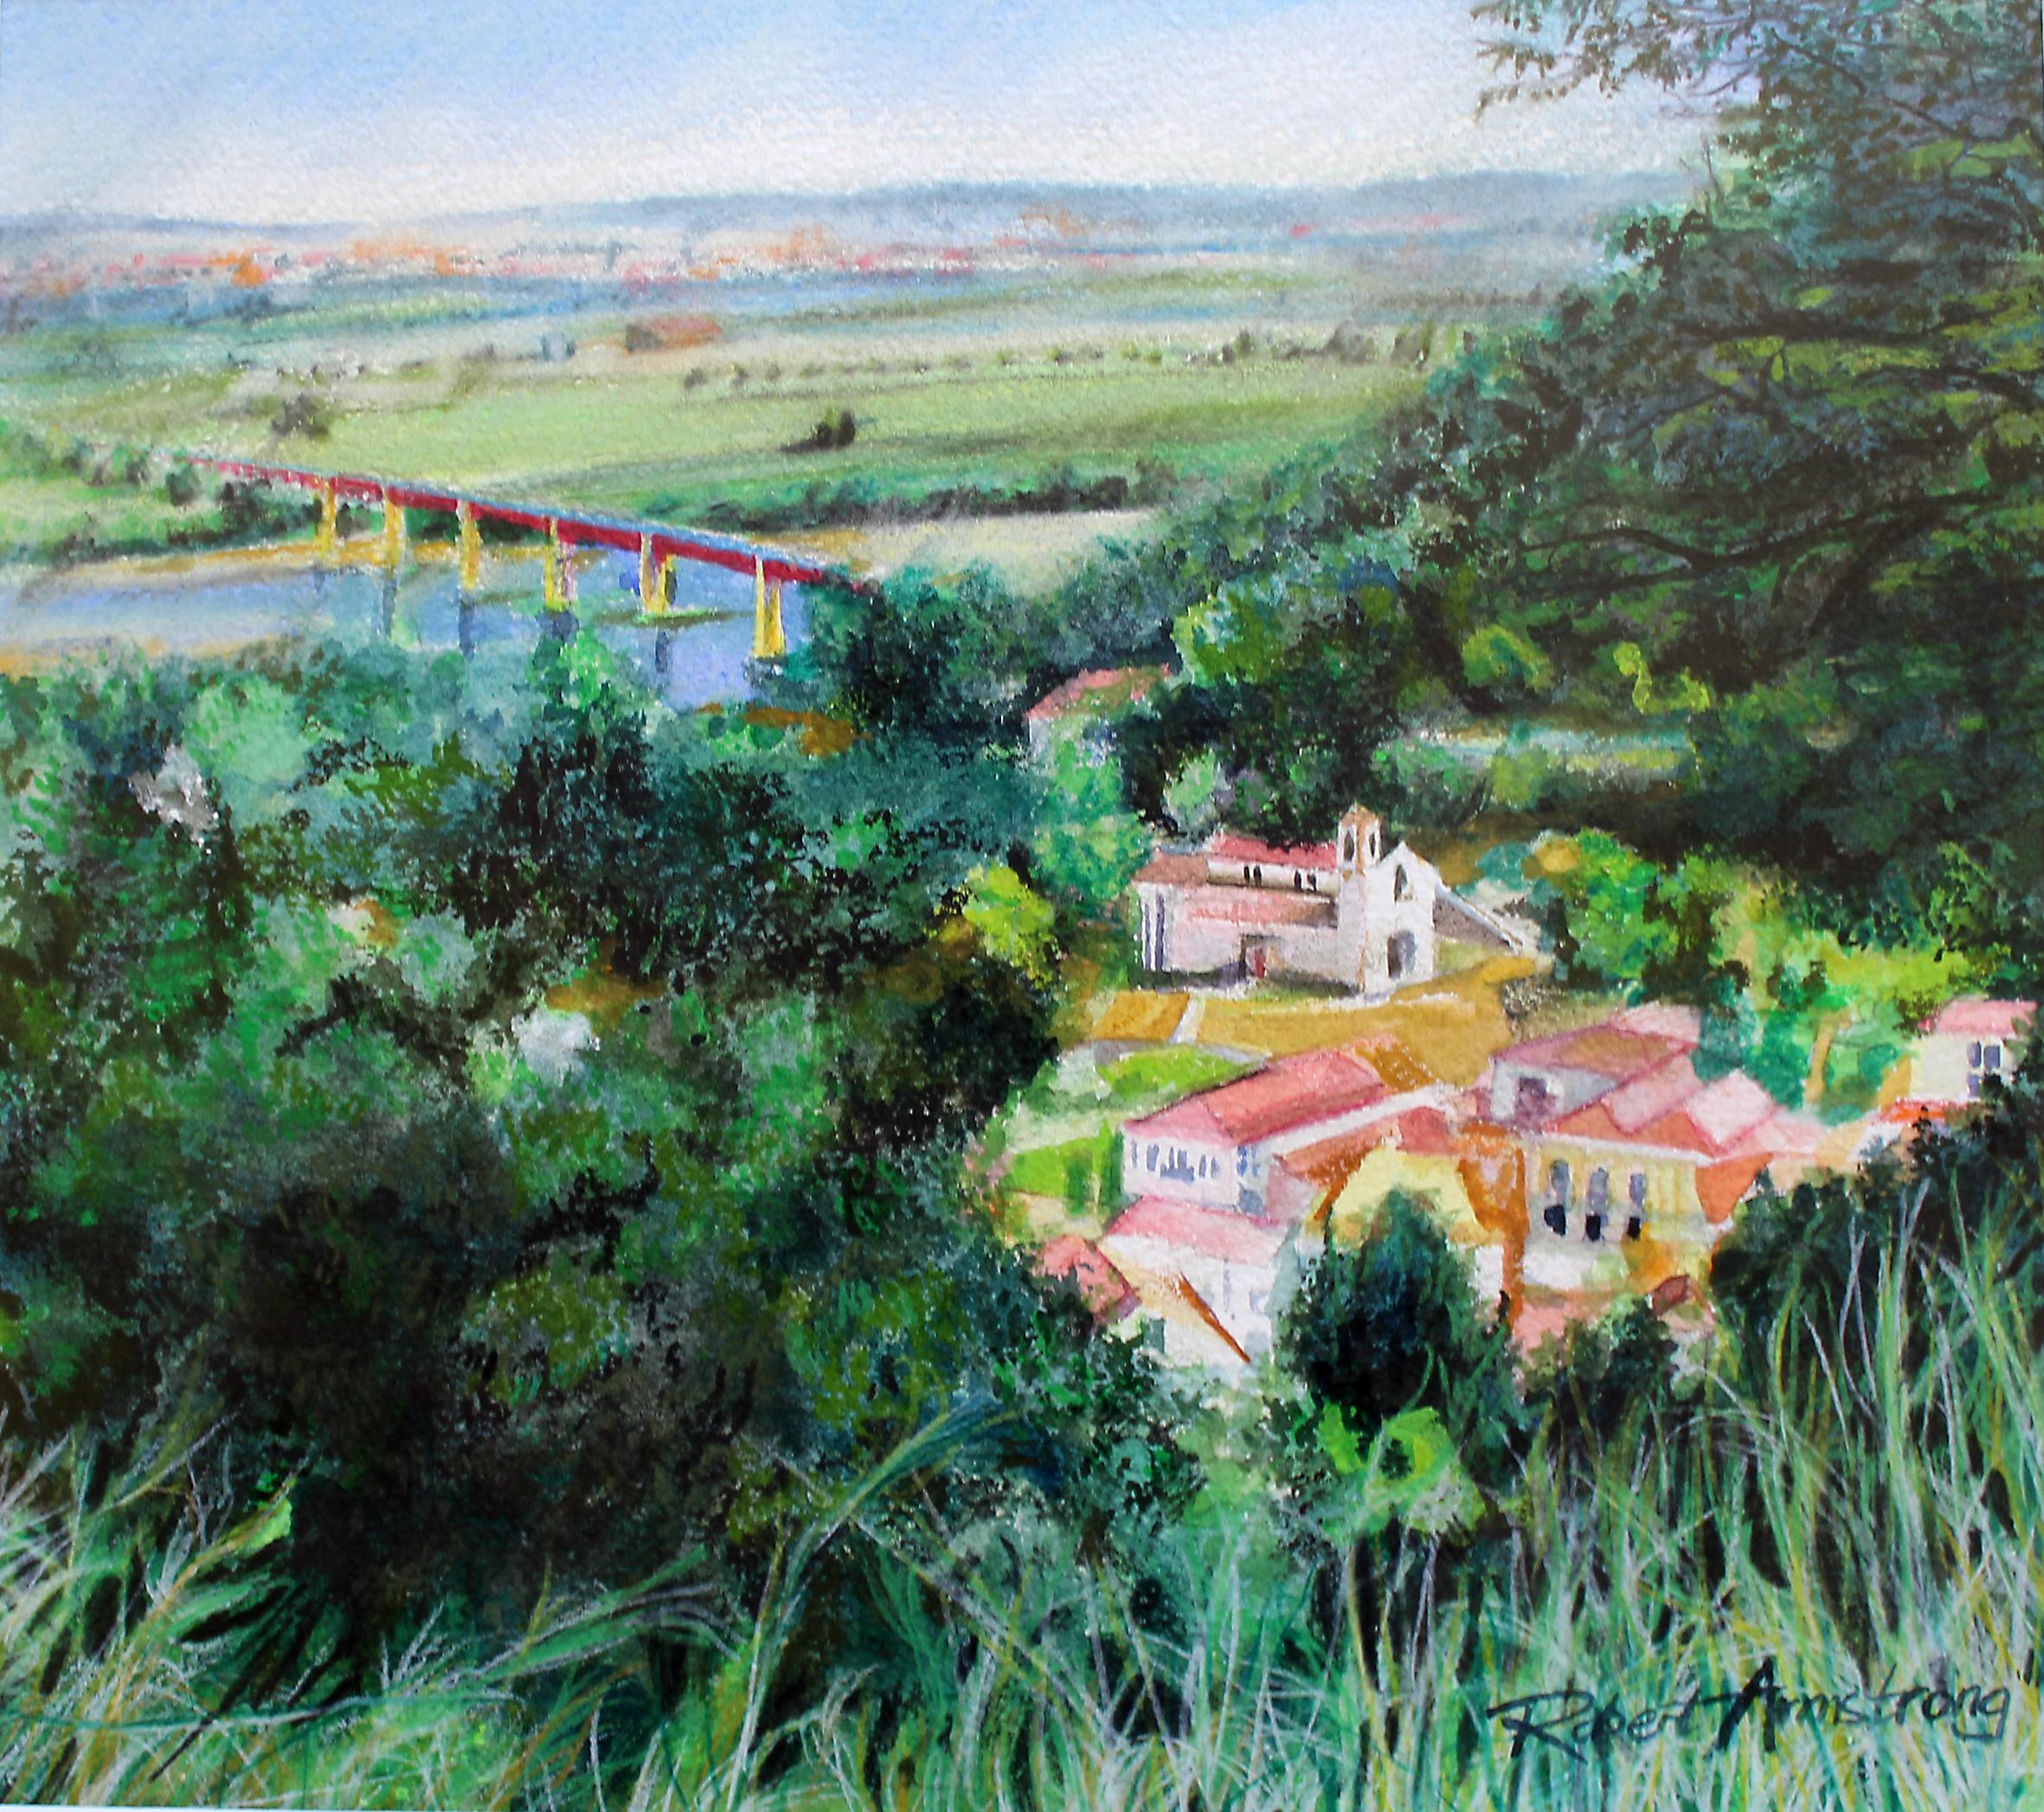 Santarém Hamlet (Portugal)